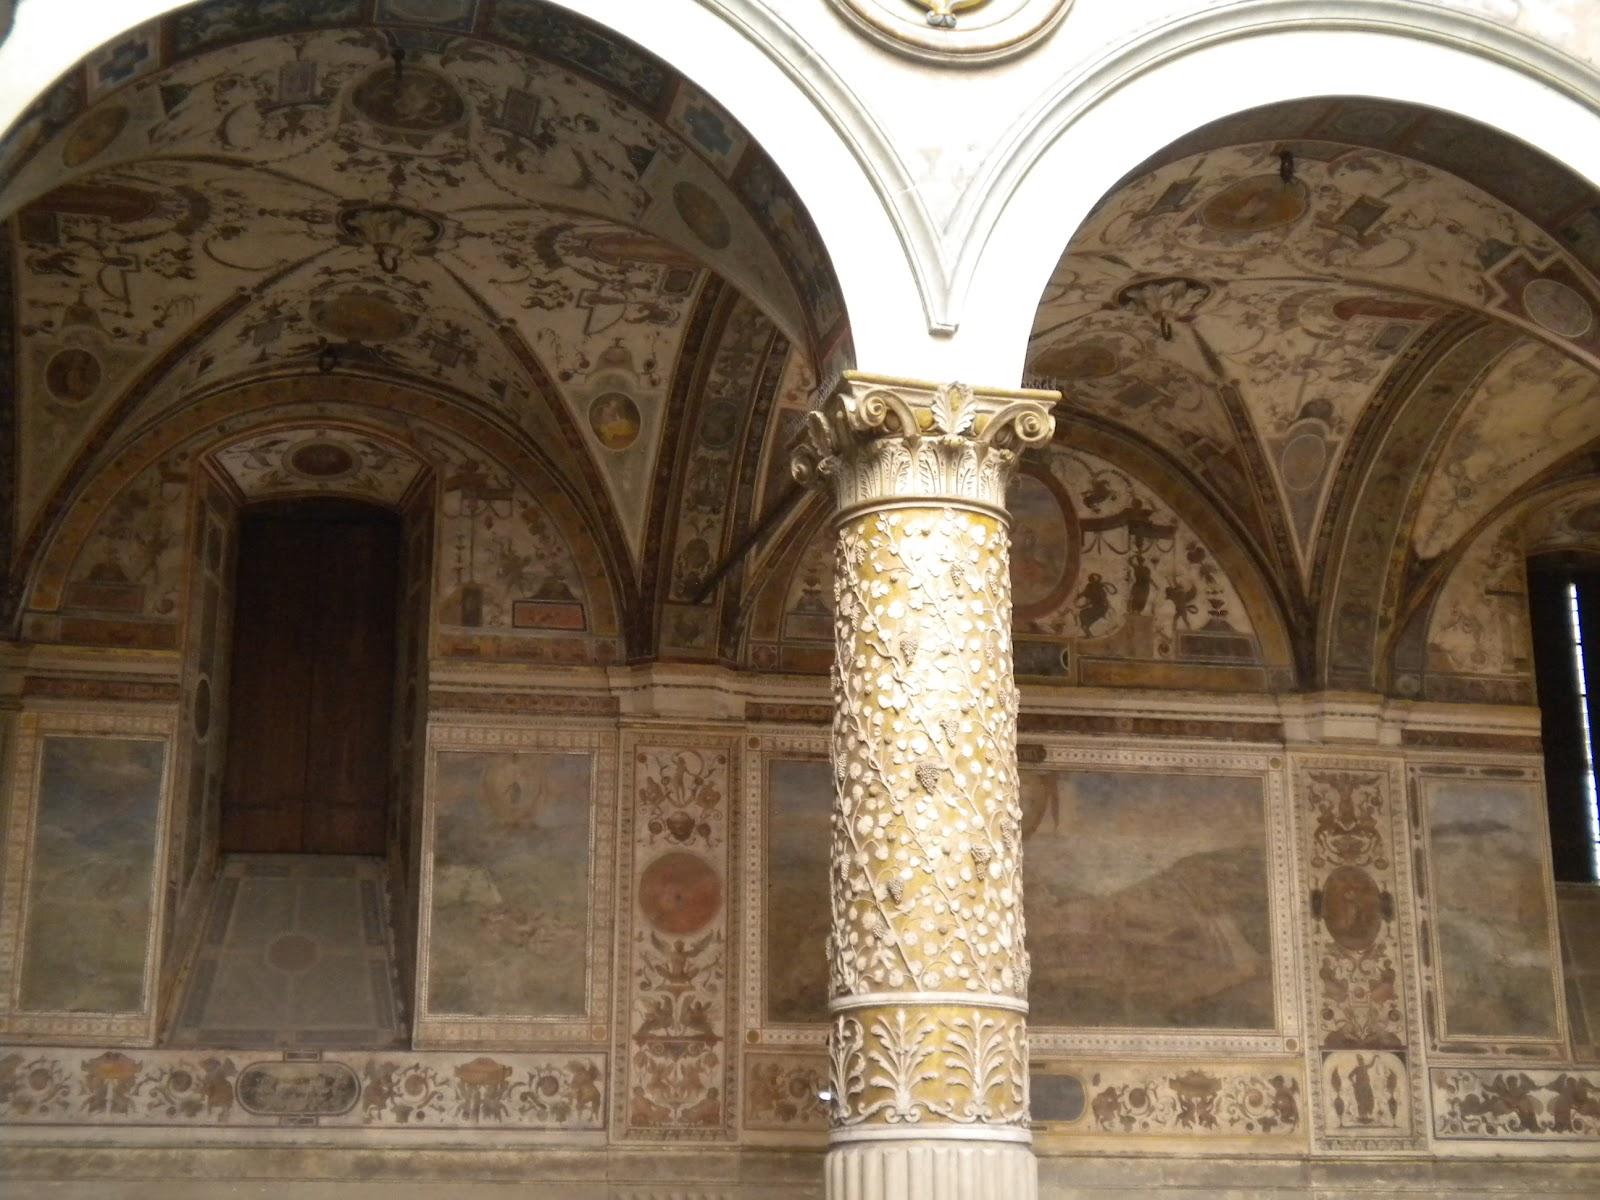 palazzo vecchio entrance - photo #29